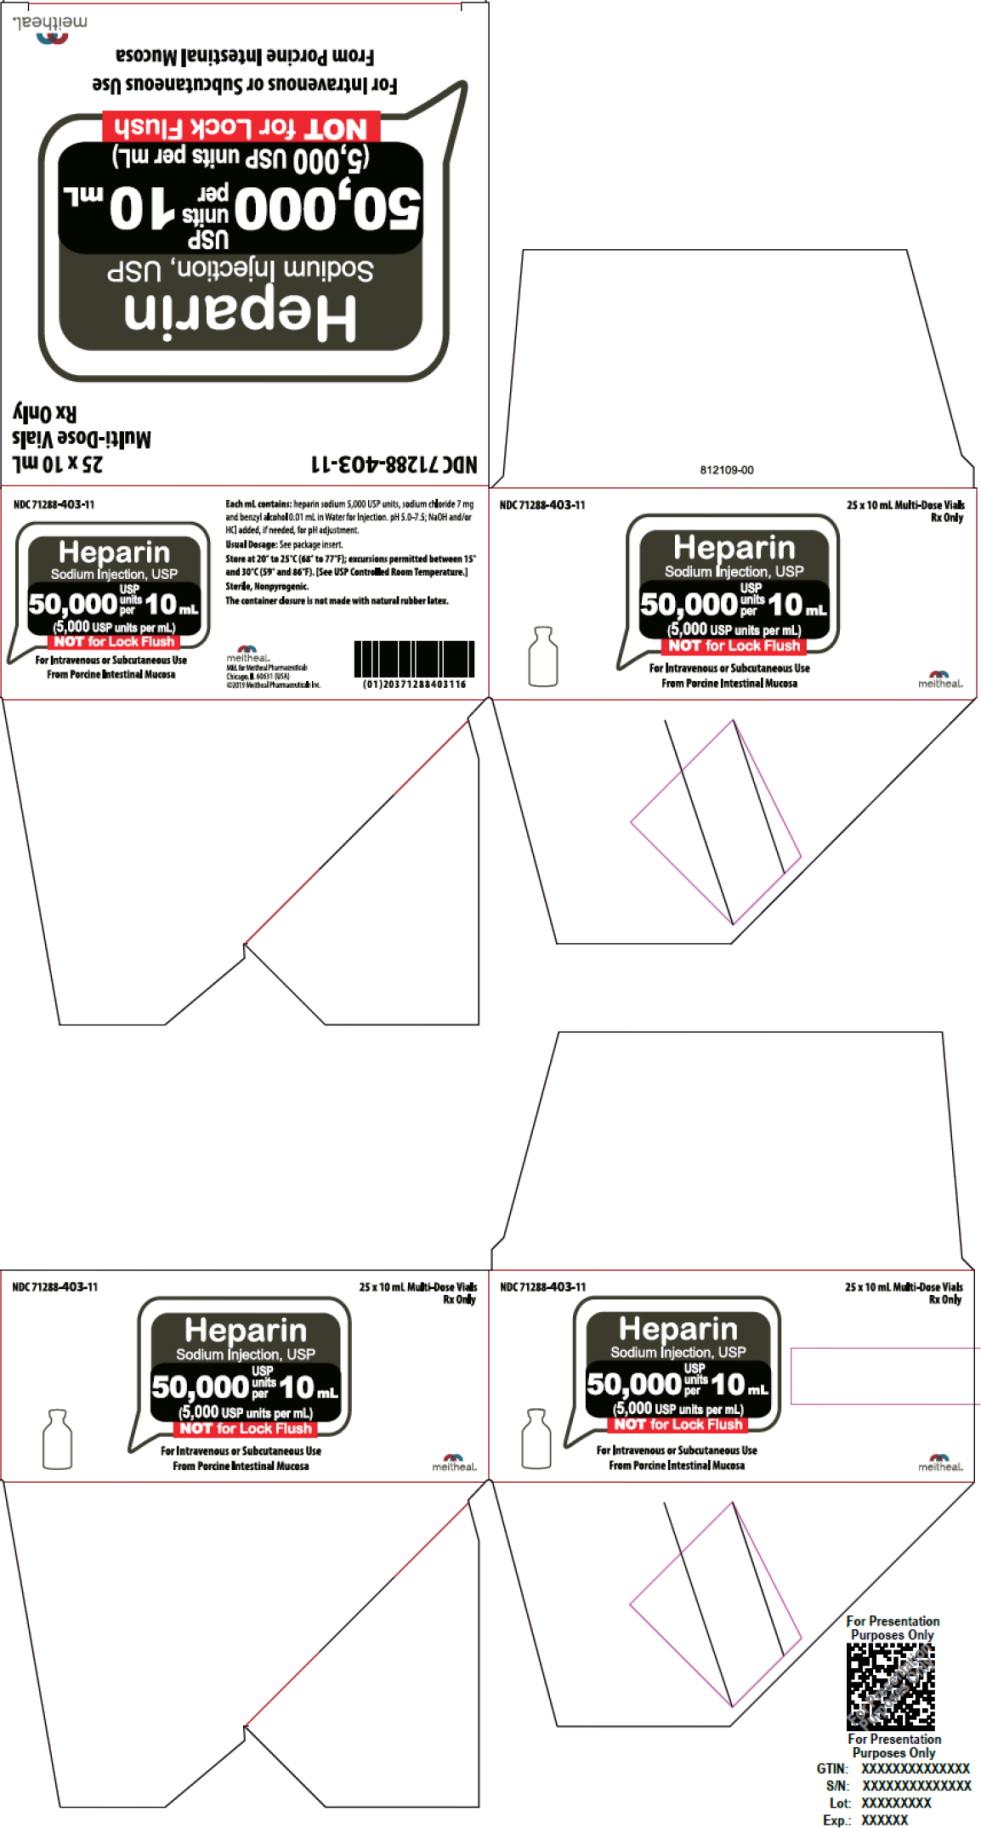 Principal Display Panel – Heparin Sodium Injection, USP 50,000 USP Carton